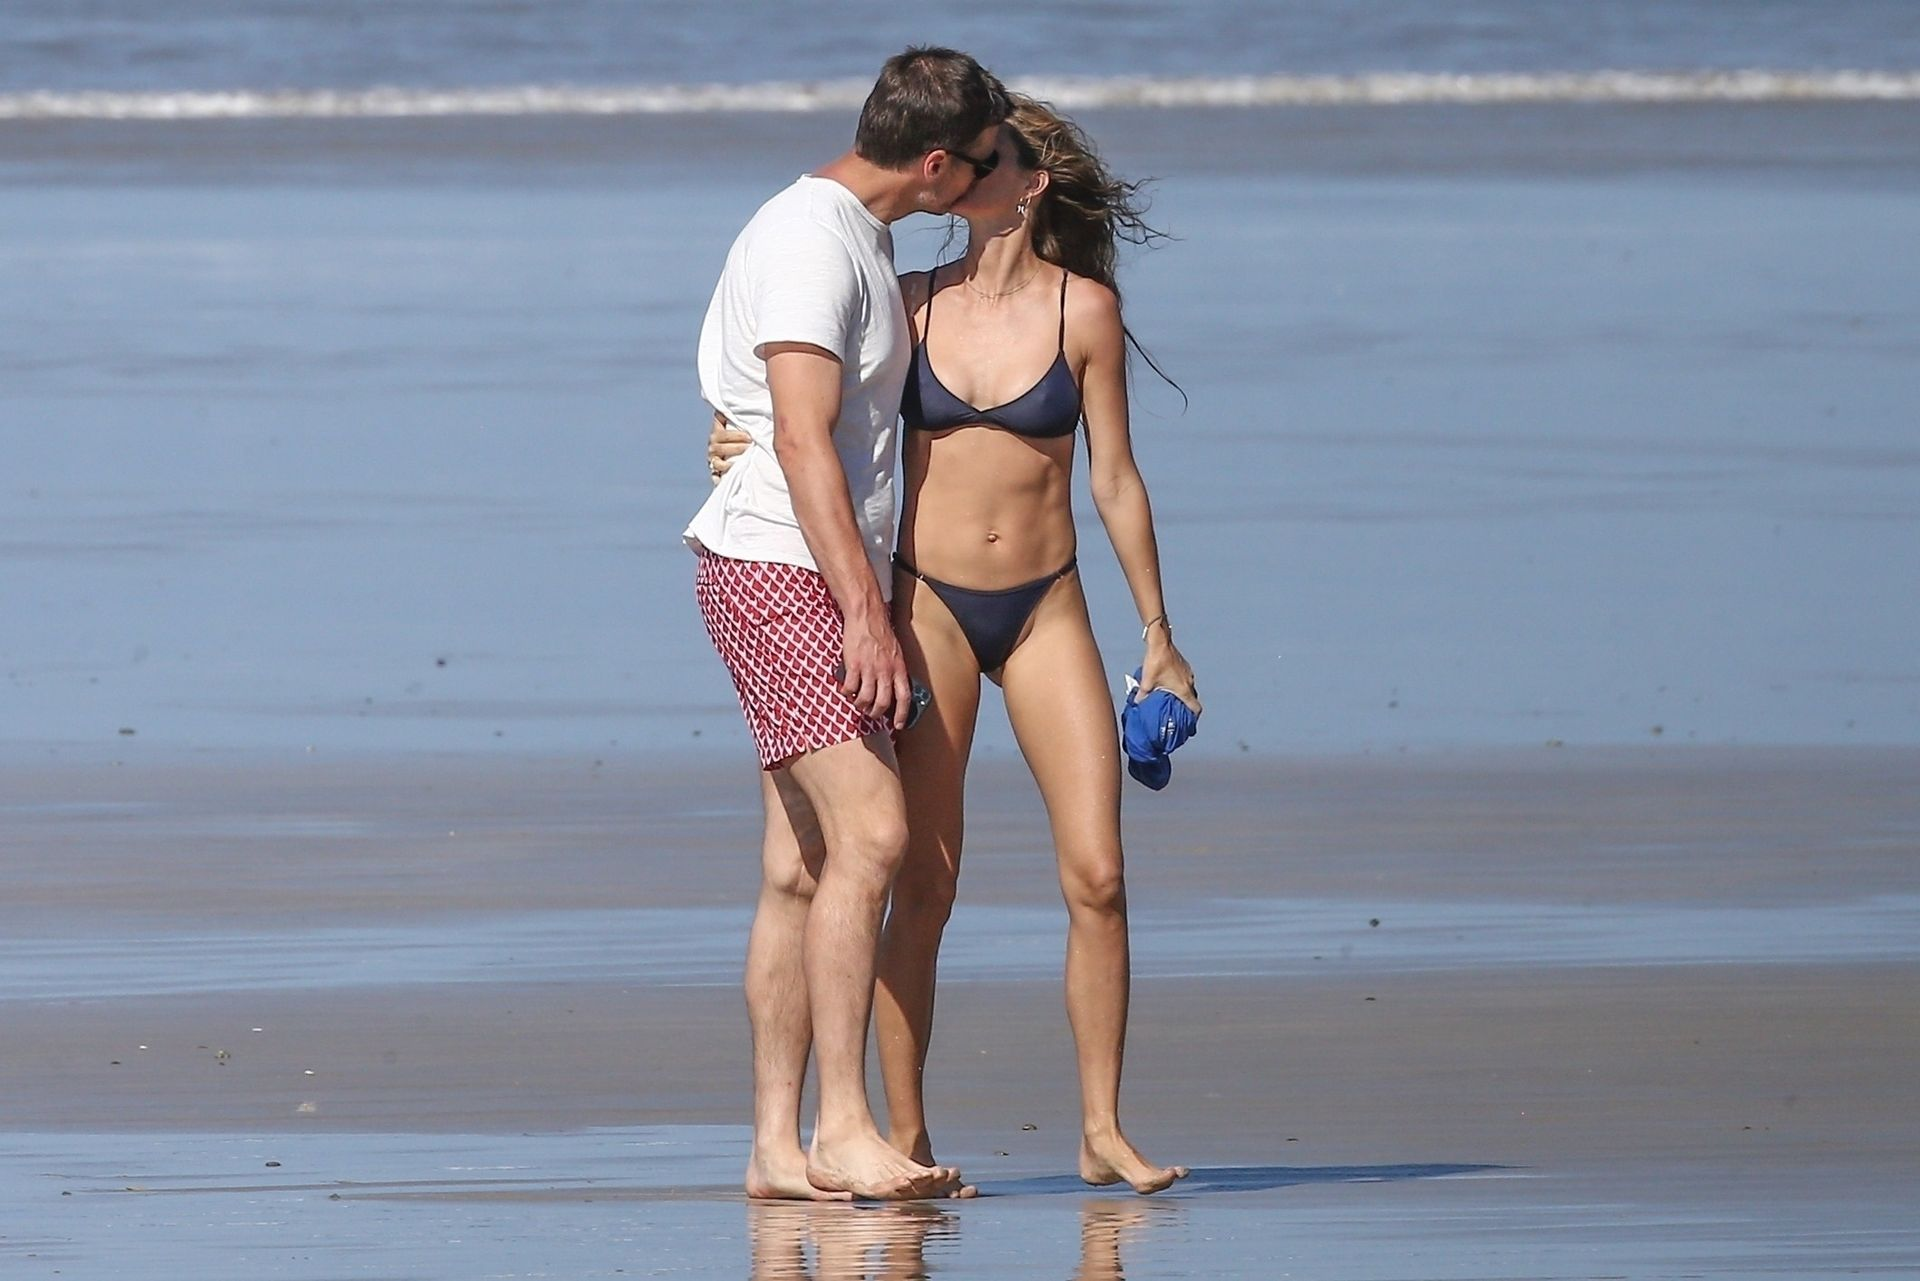 Tom Brady & Gisele Bundchen Pack On The Pda At The Beach 0018